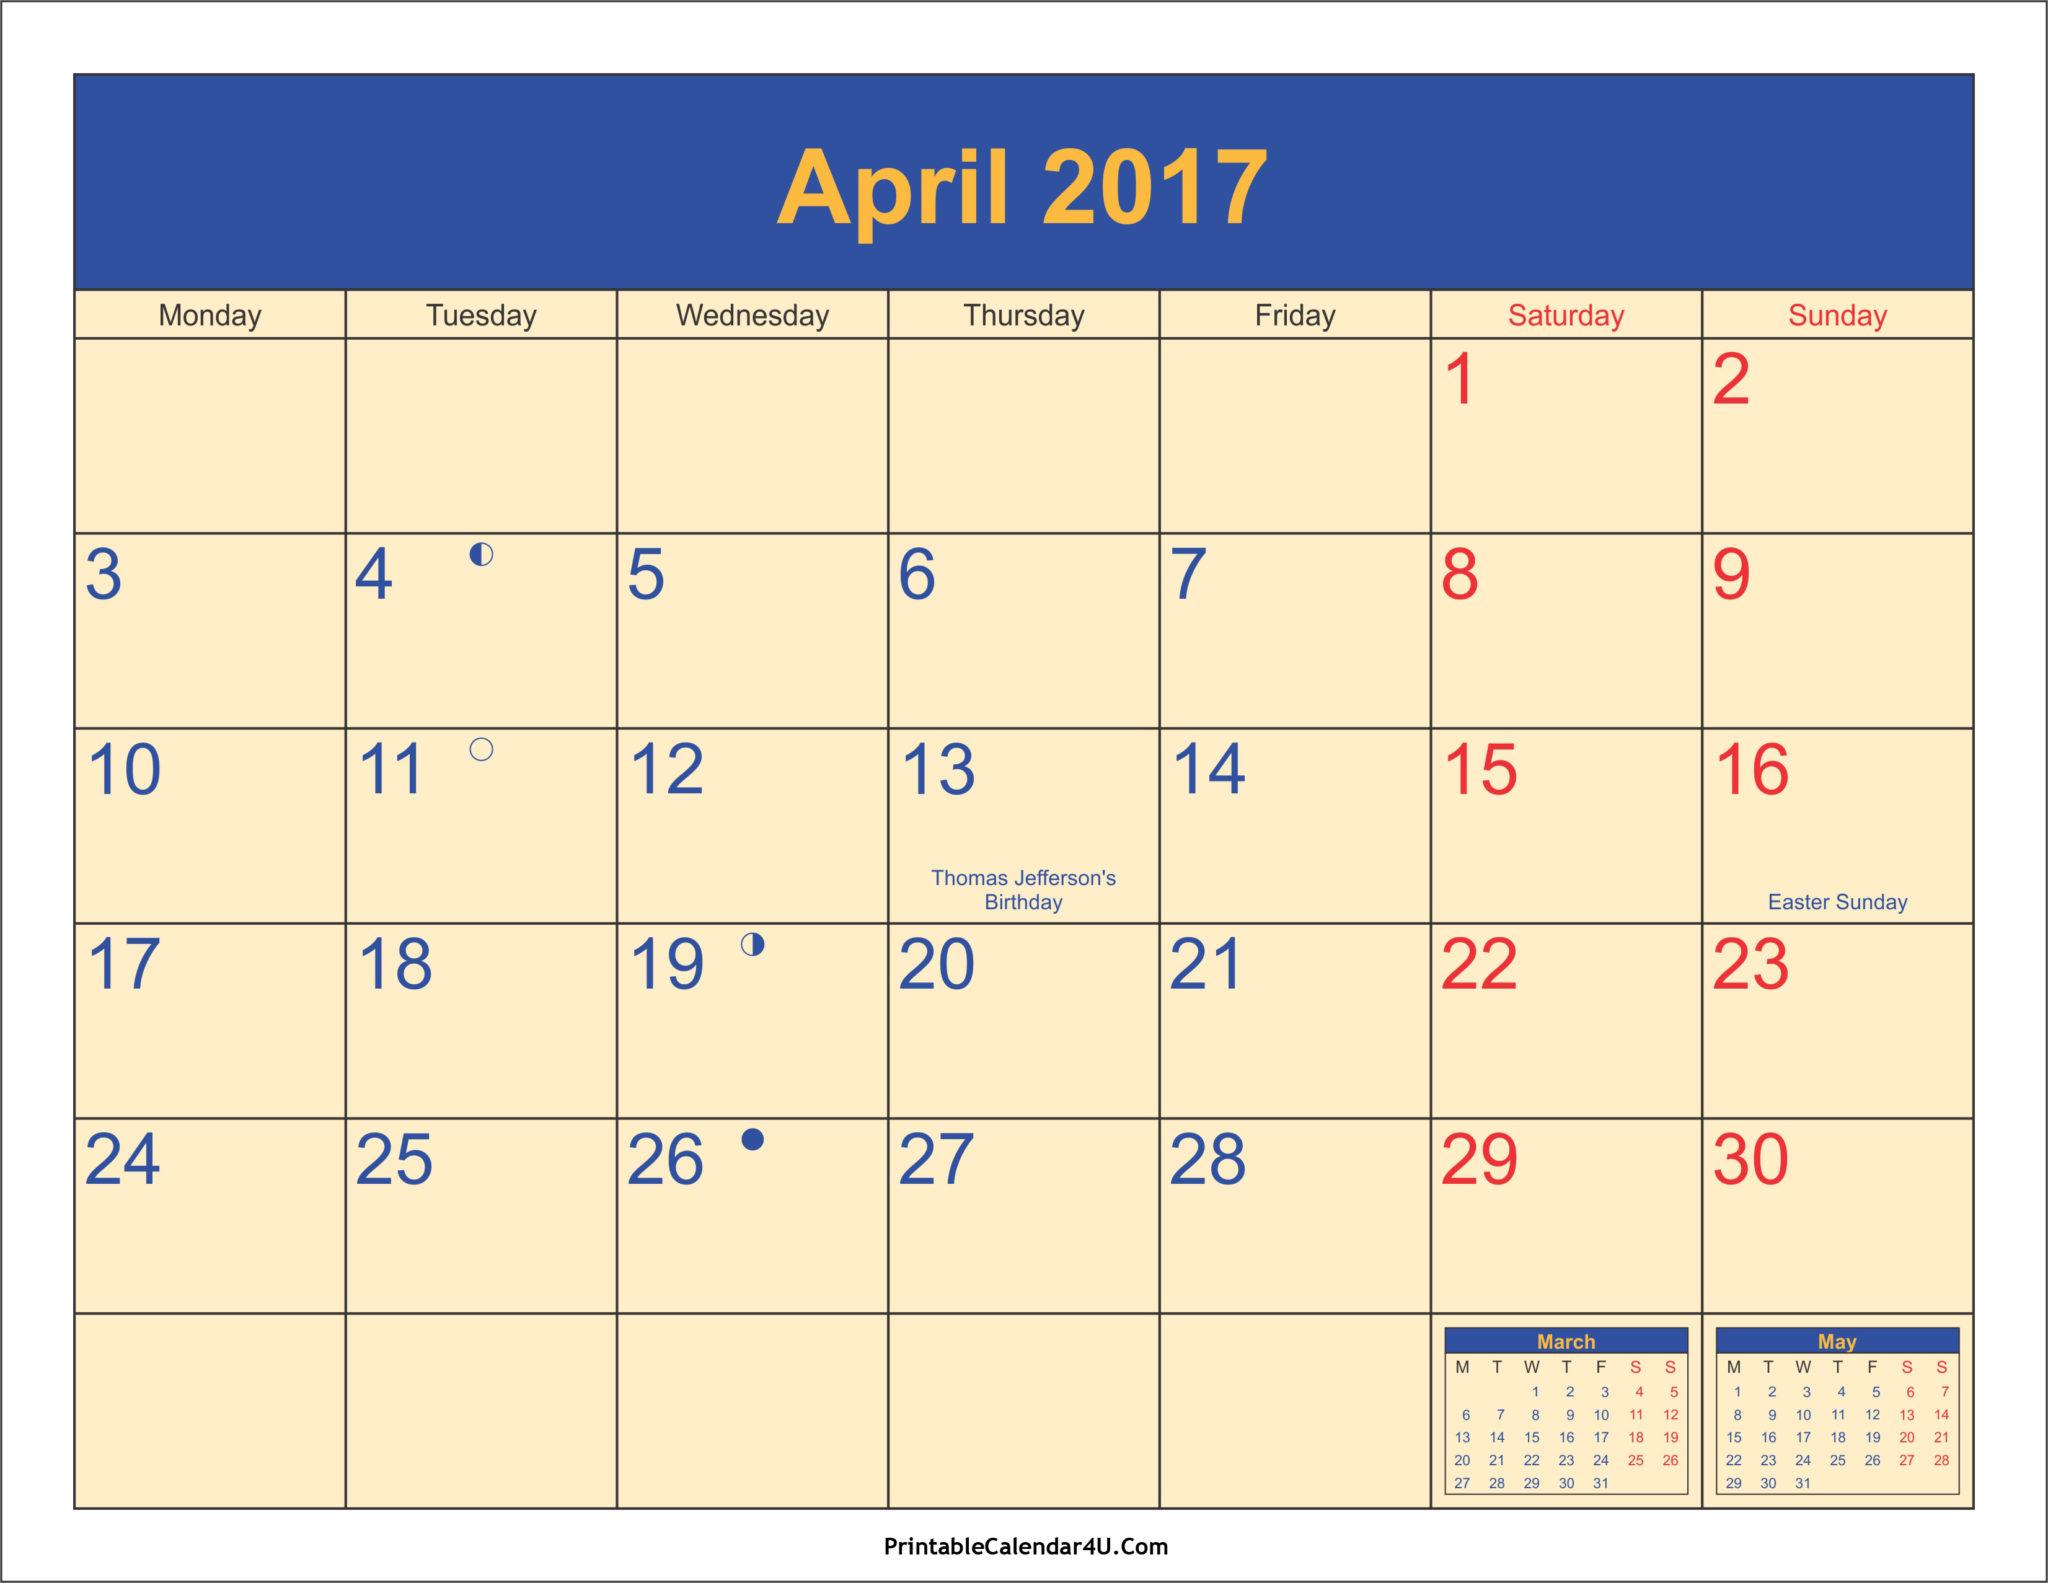 april 2017 printable calendar with holidays